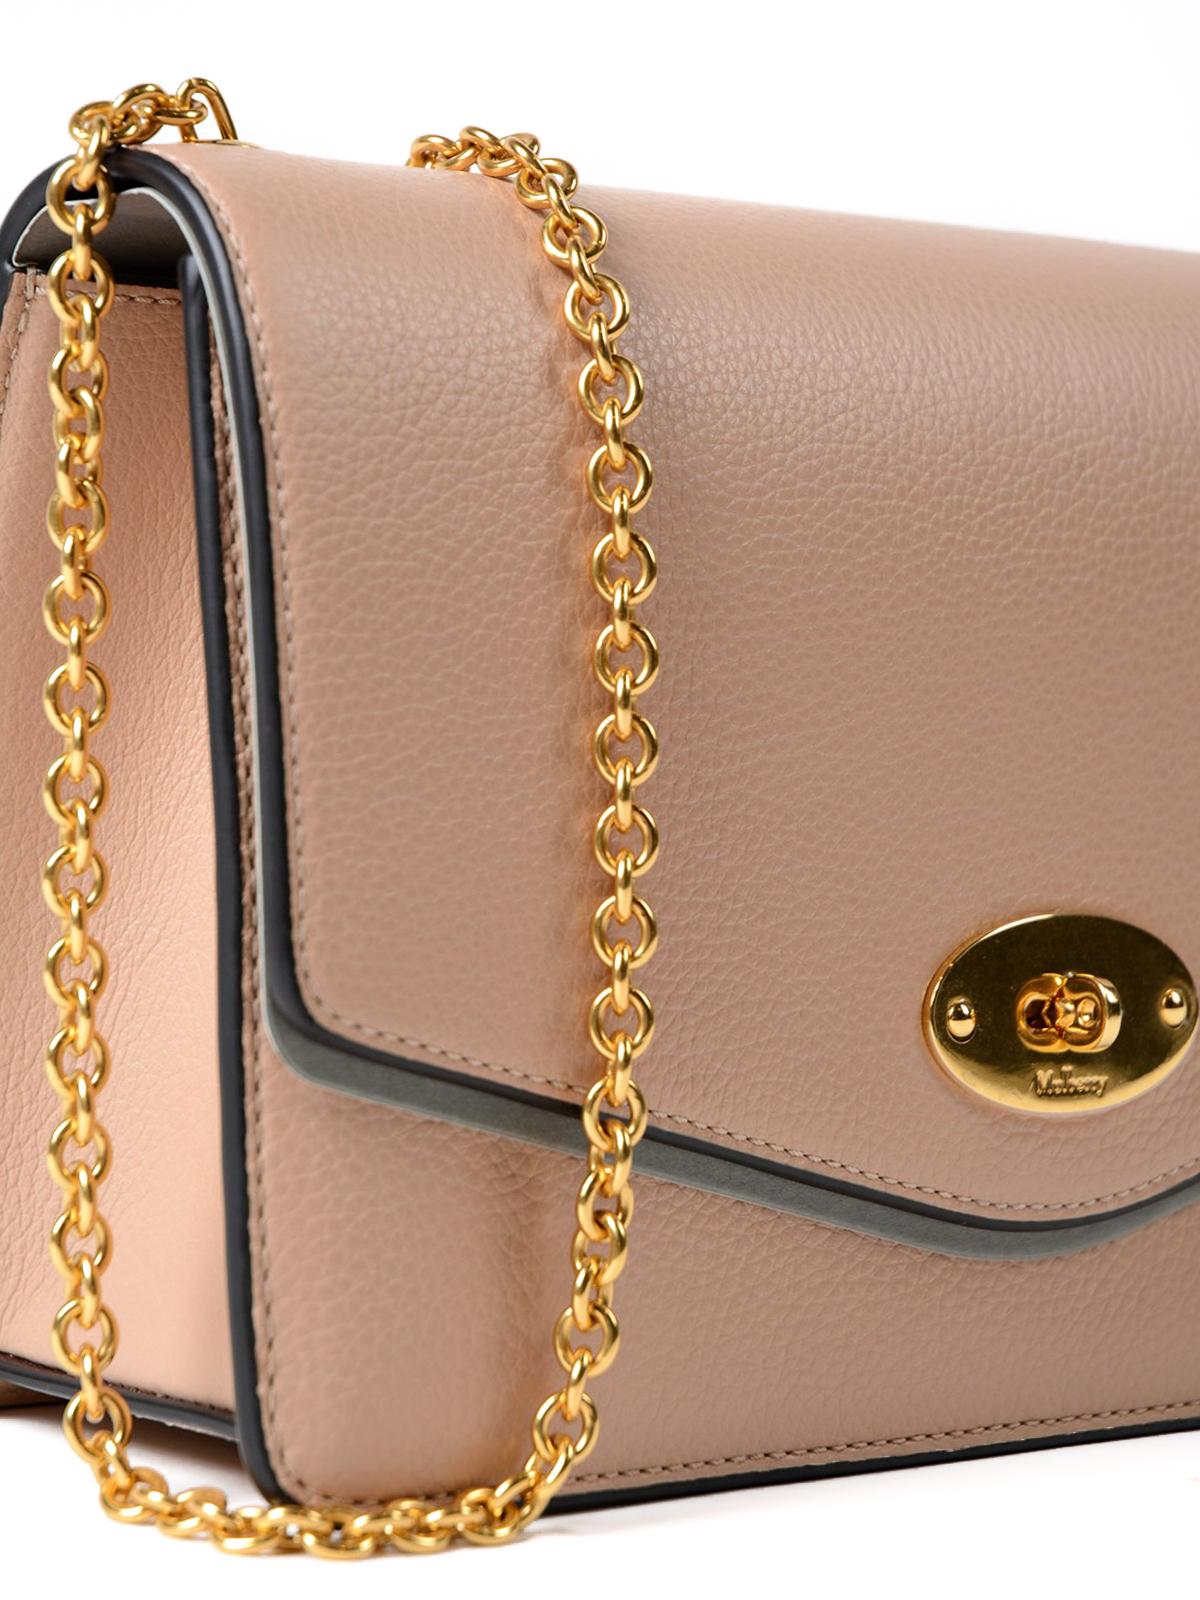 ... 50% off darley pale pink leather bag shop online mulberry 264e9 245ec ec1166a116d45